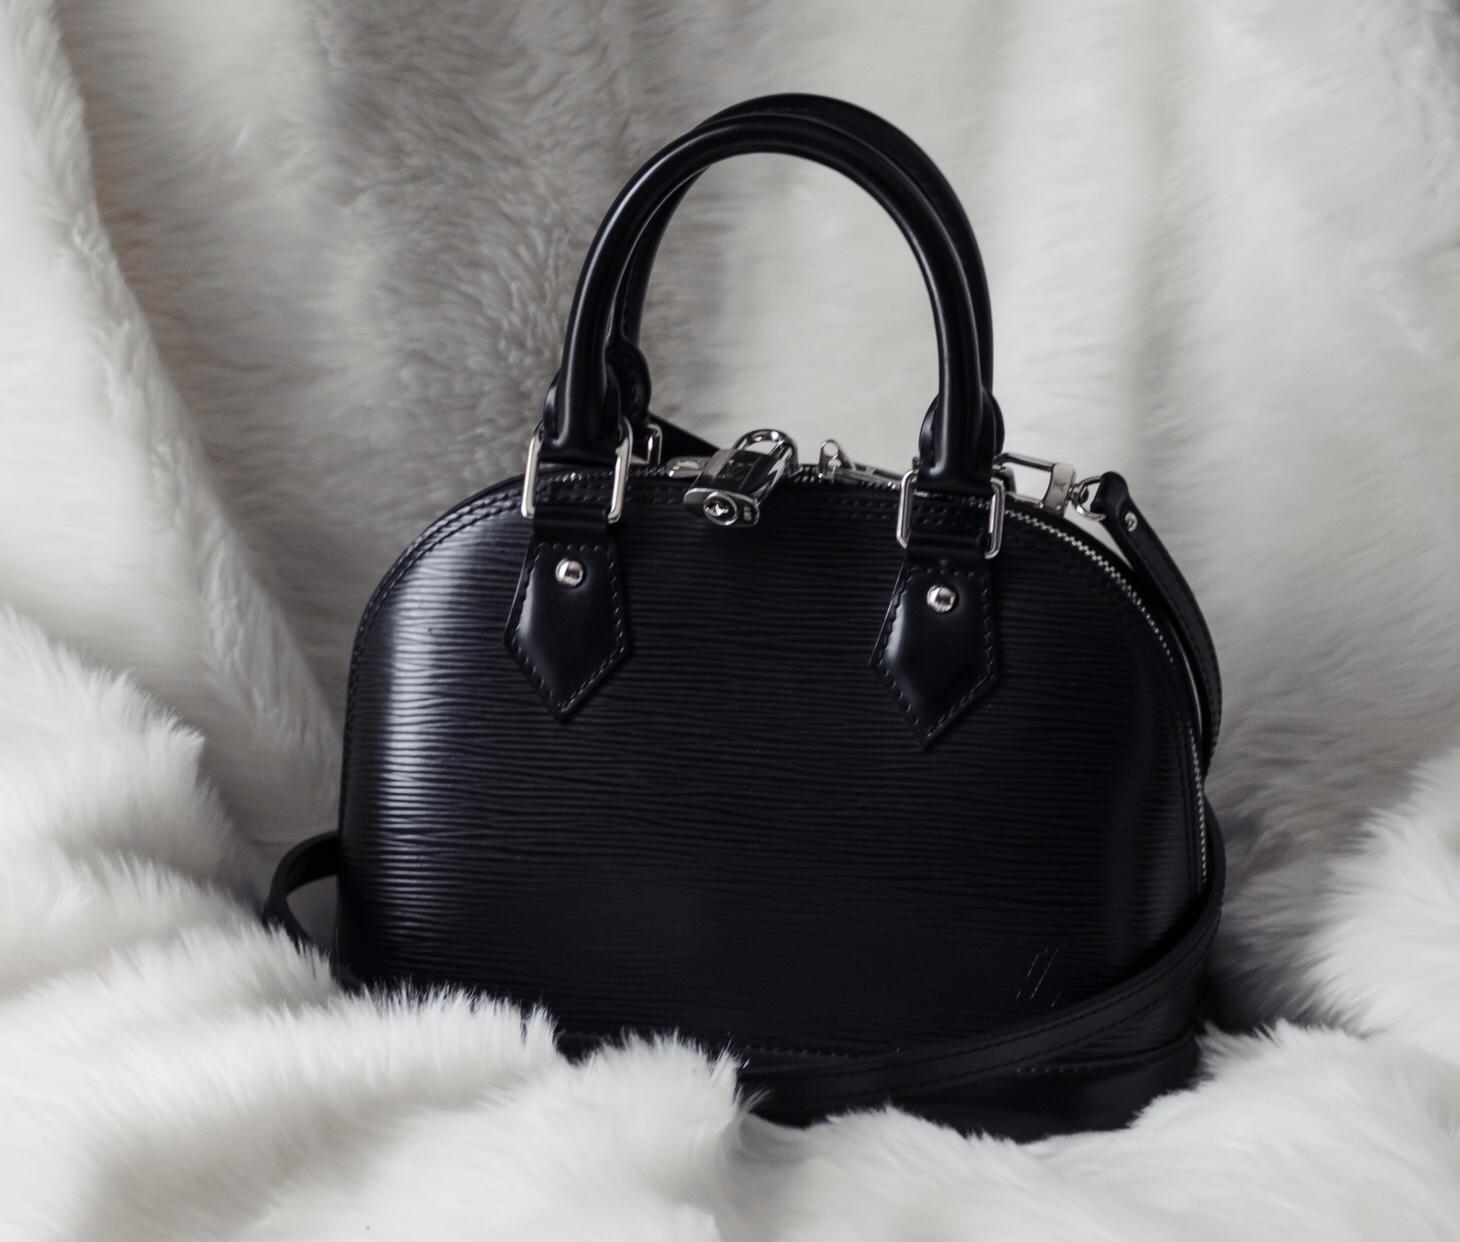 fb5b37a5bad Bag Review: Louis Vuitton Black Epi Alma BB – Becca Risa Luna